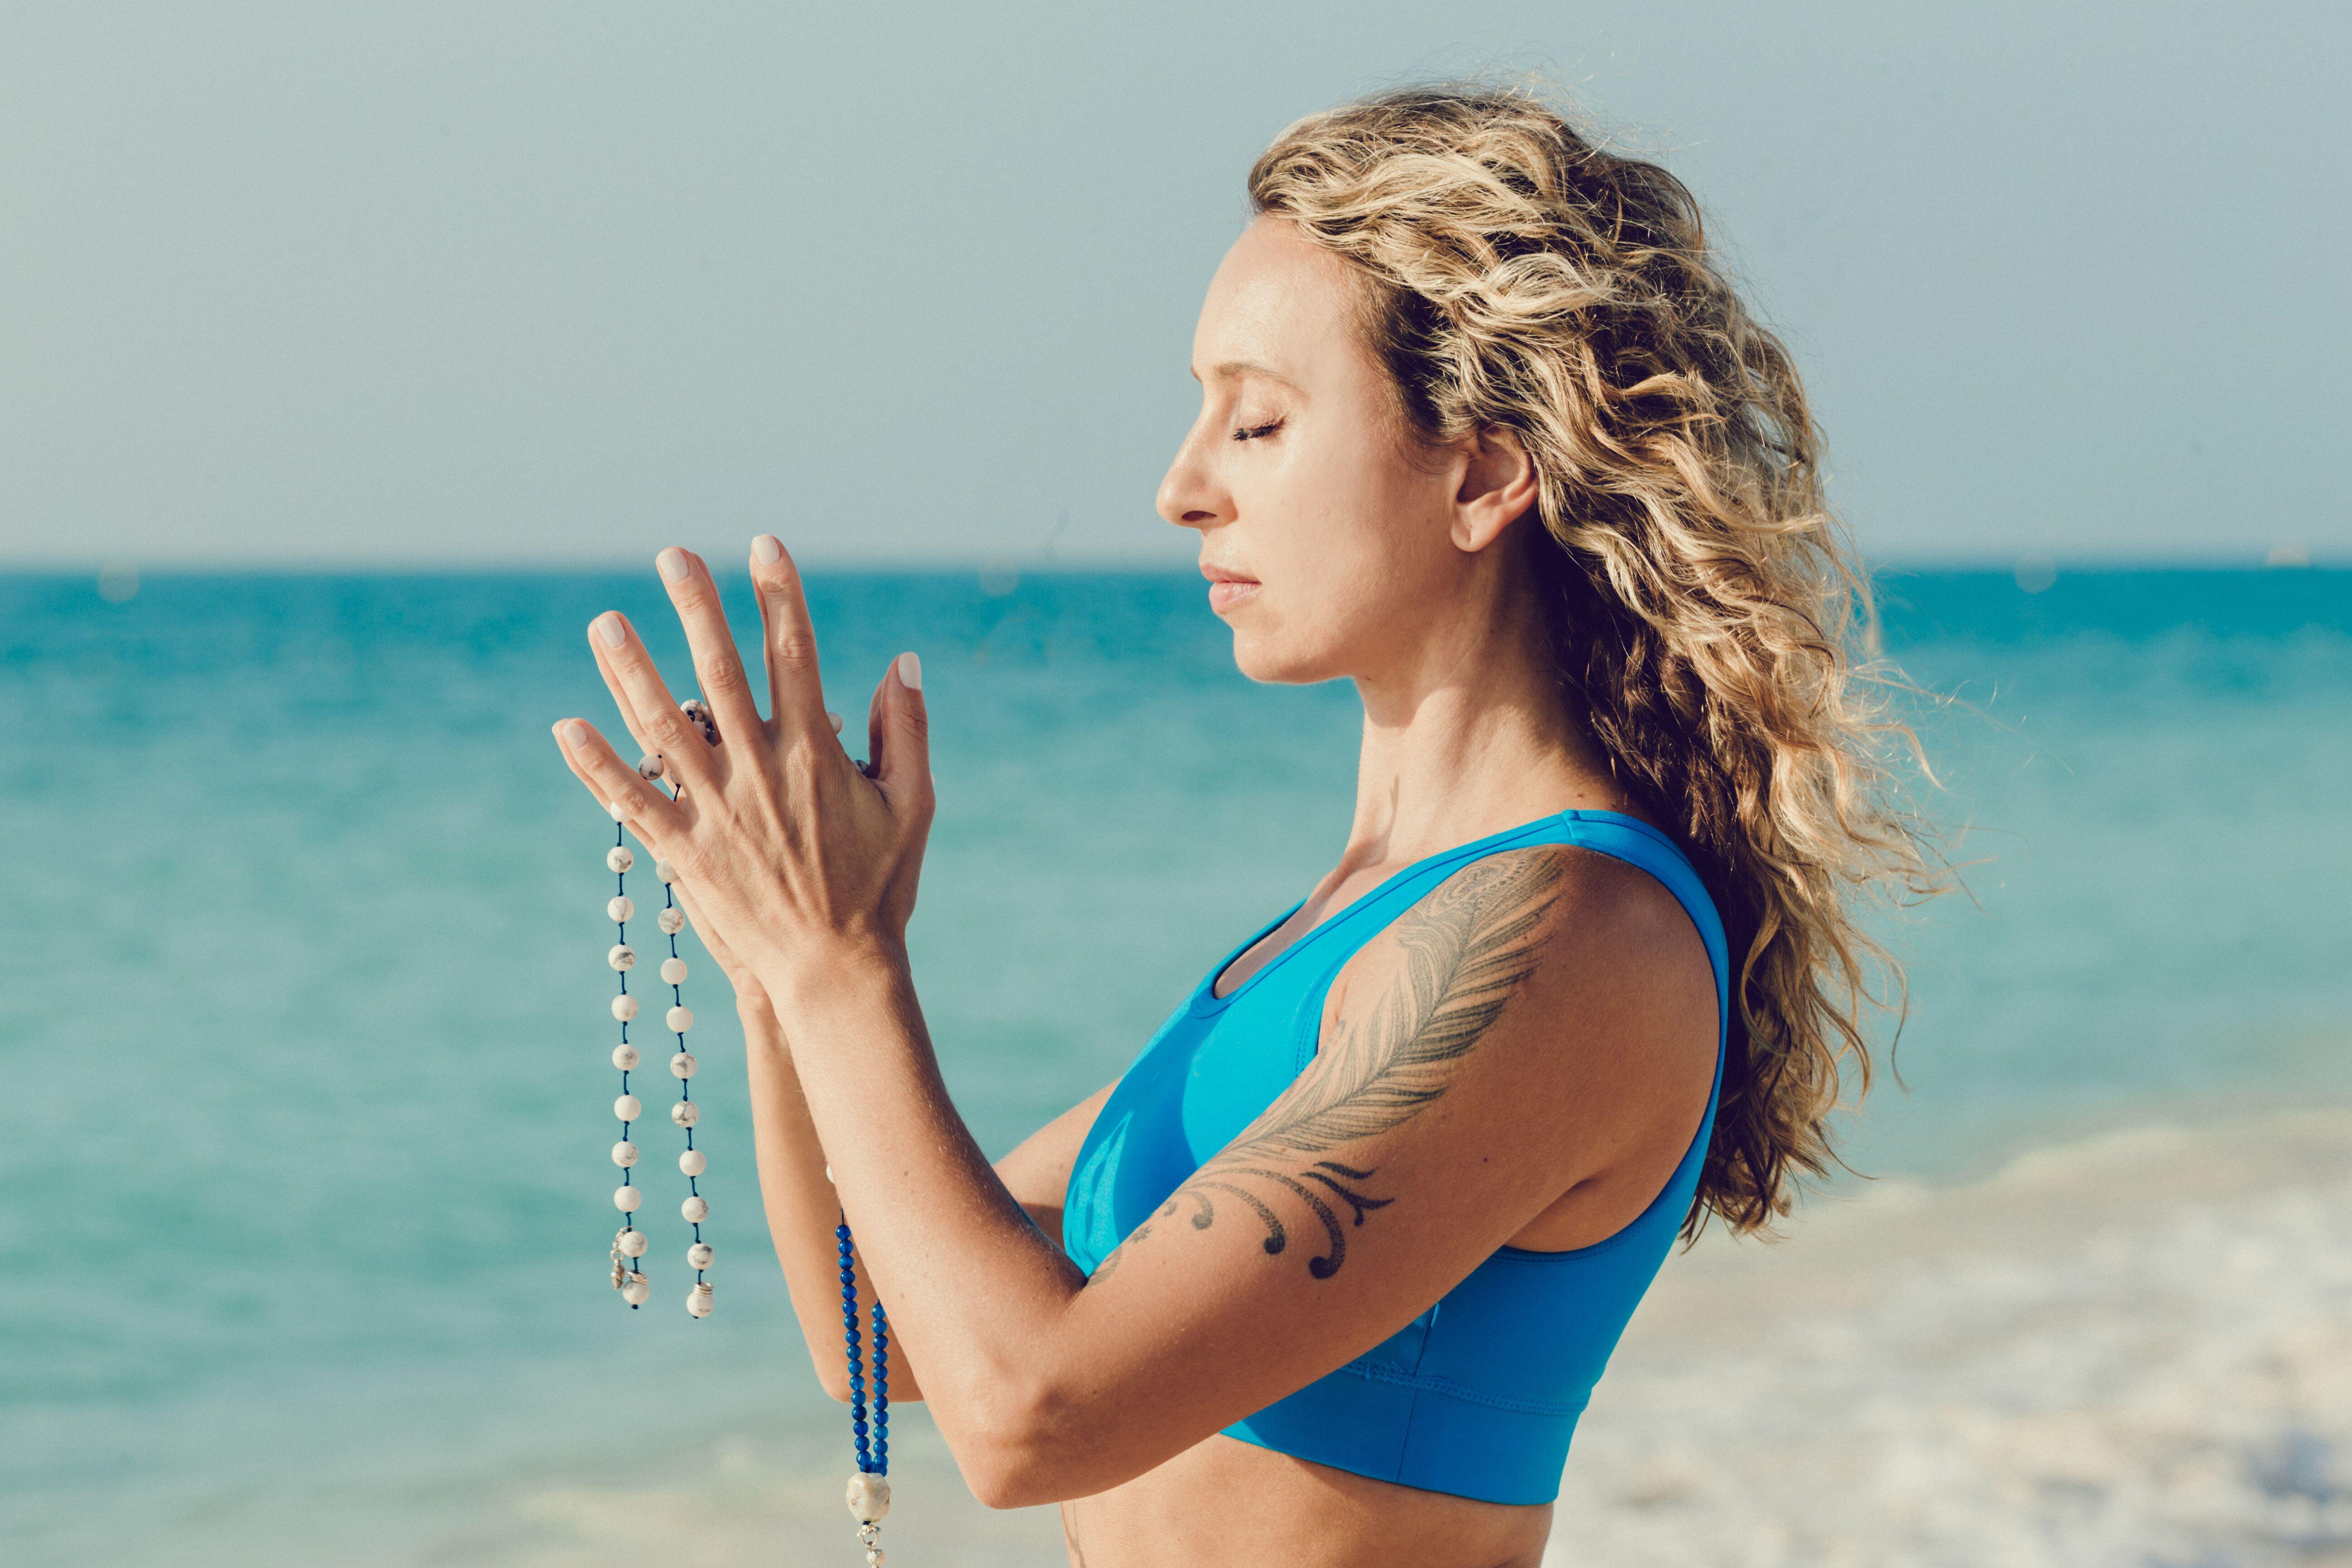 3- 10 July 2021 | Melissa Ghattas | Divine union of consciousness & energy